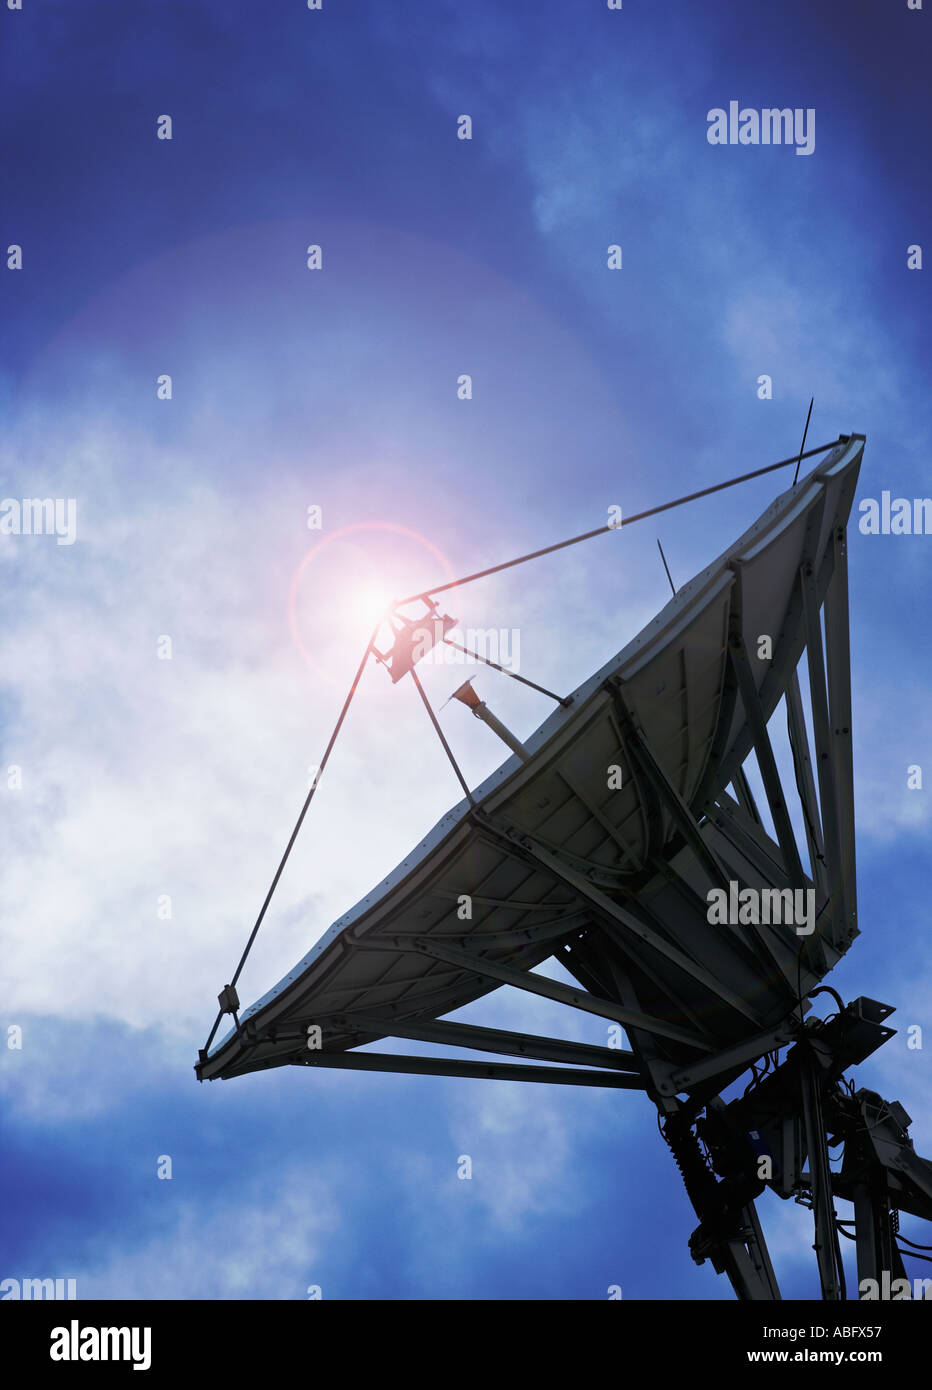 Silueta de antena parabólica Imagen De Stock